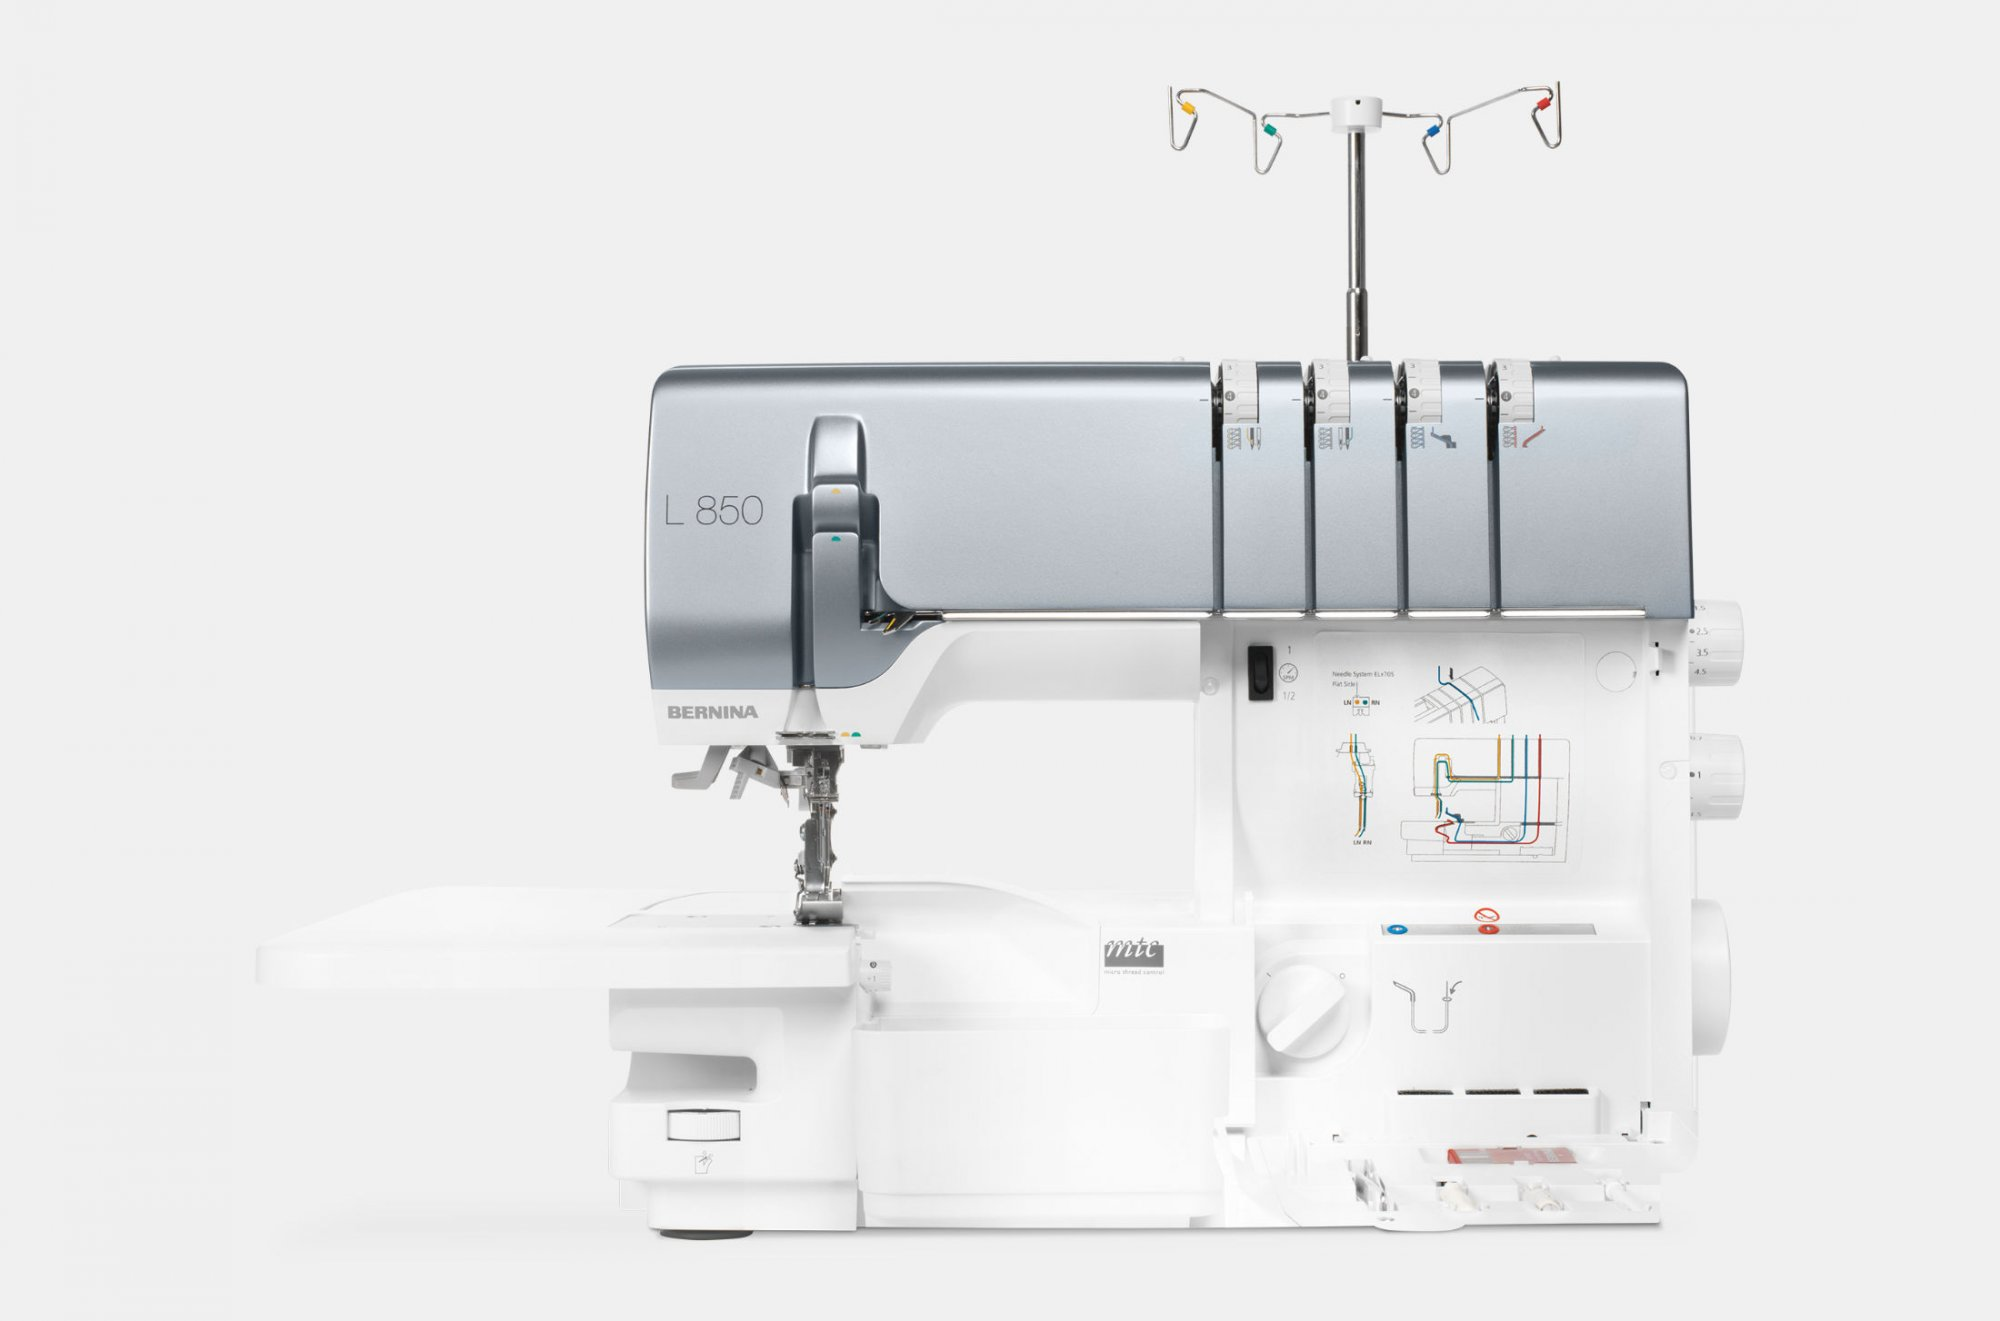 L850 - Bernina Air Threader Overlock Serger